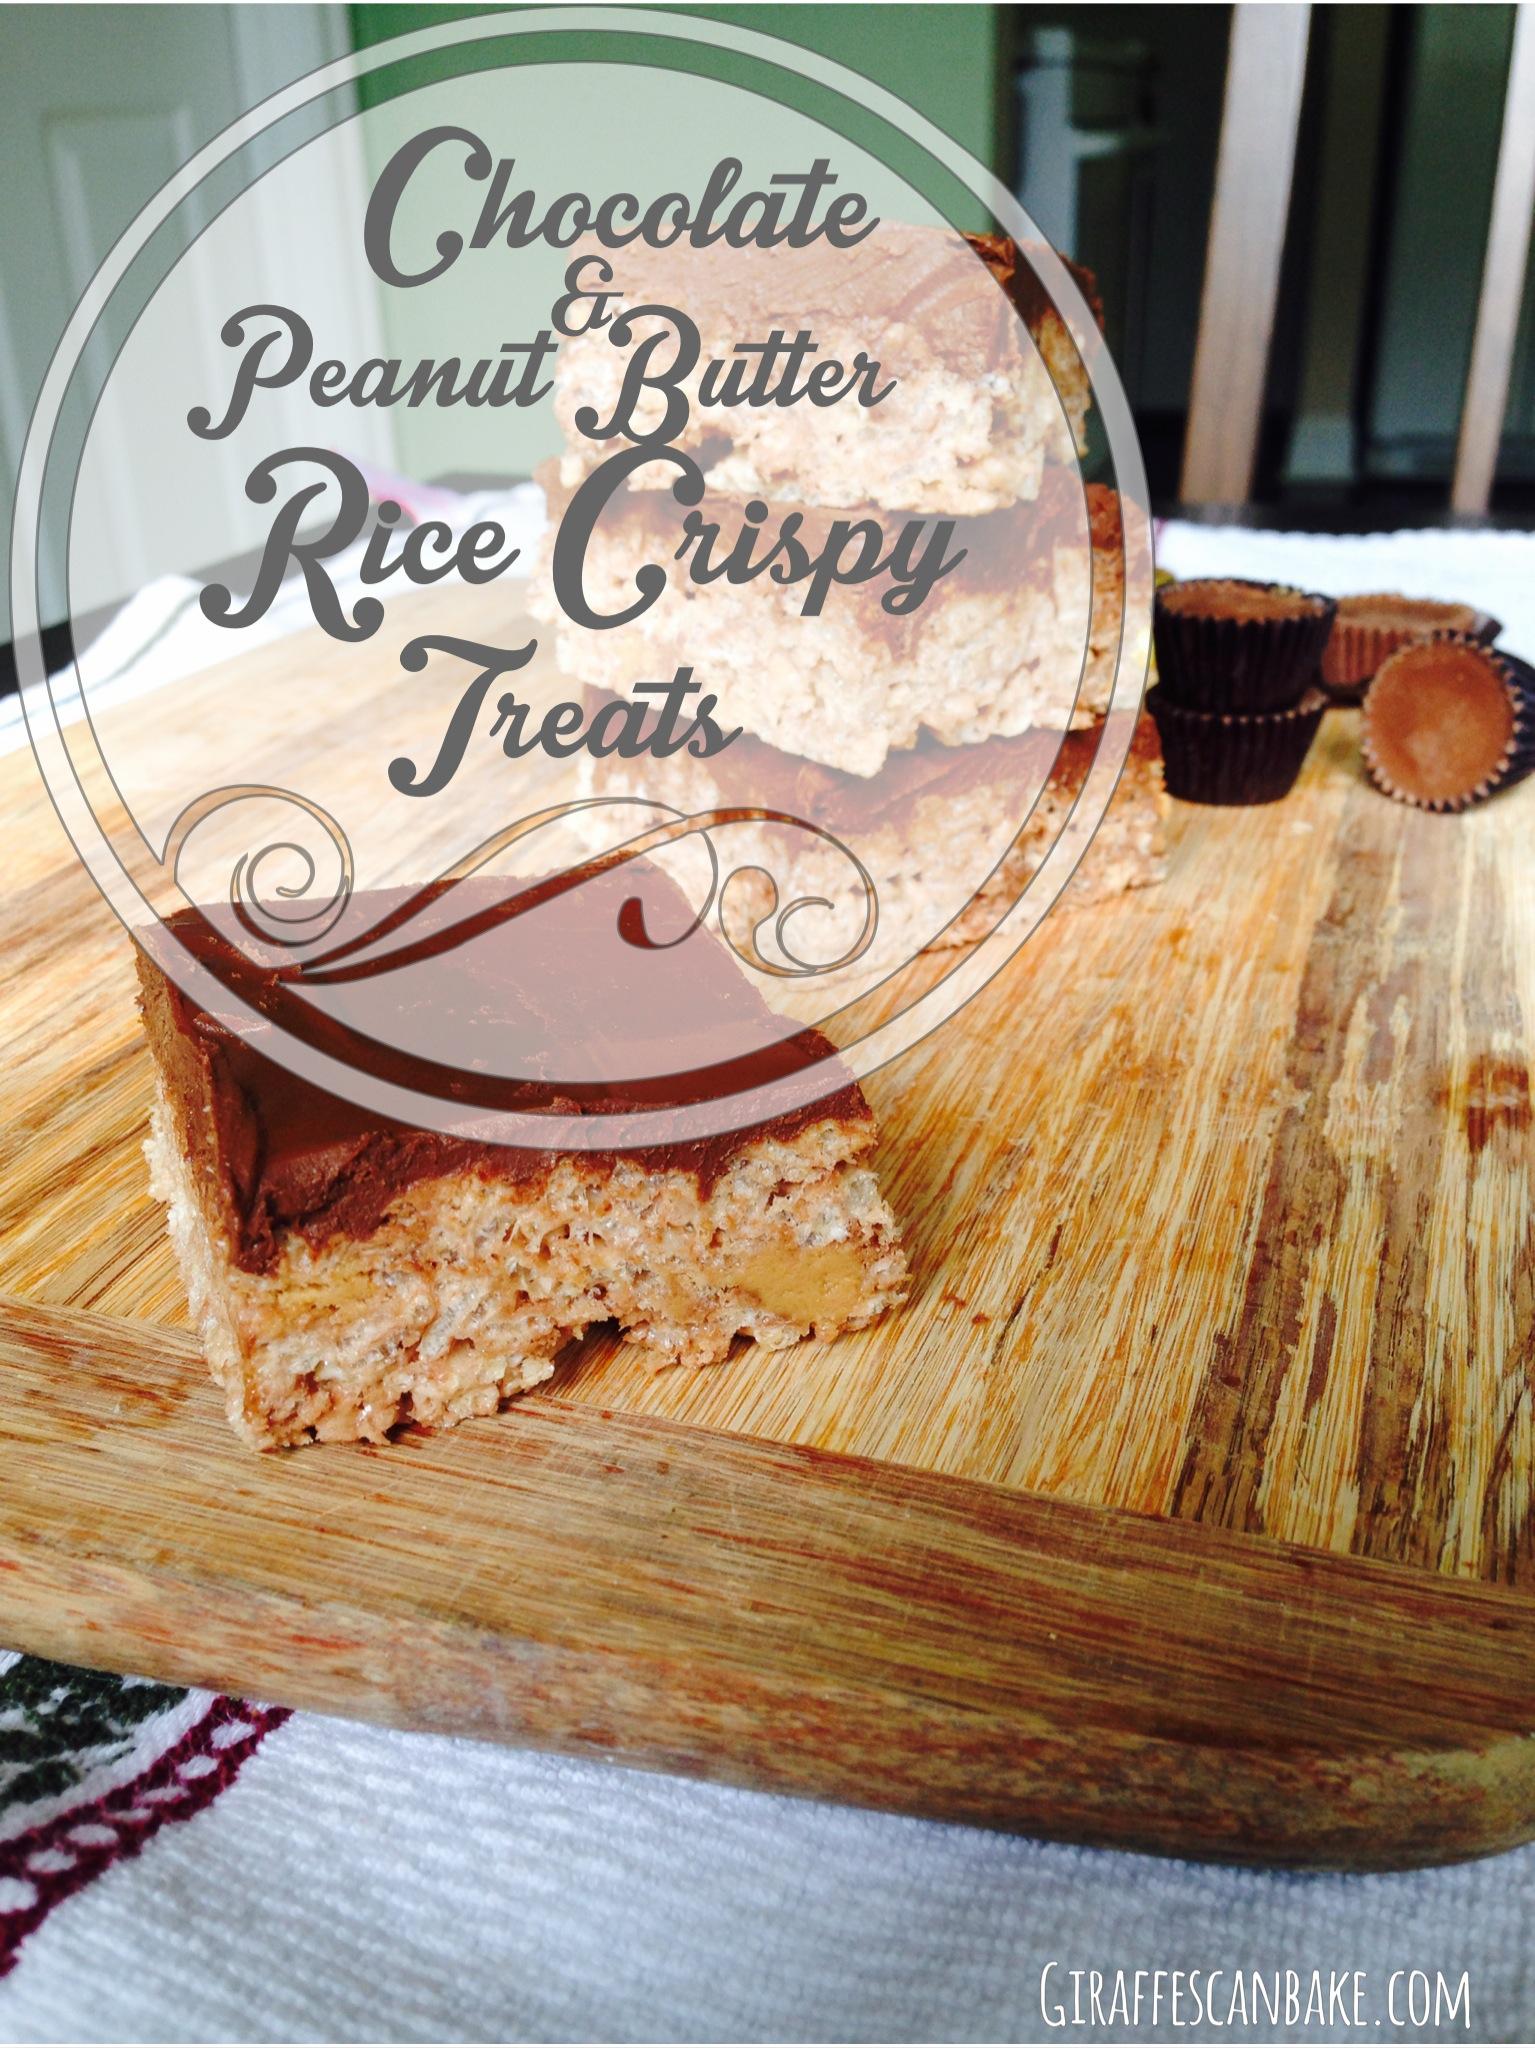 Chocolate and Peanut Butter Rice Crispy Treats